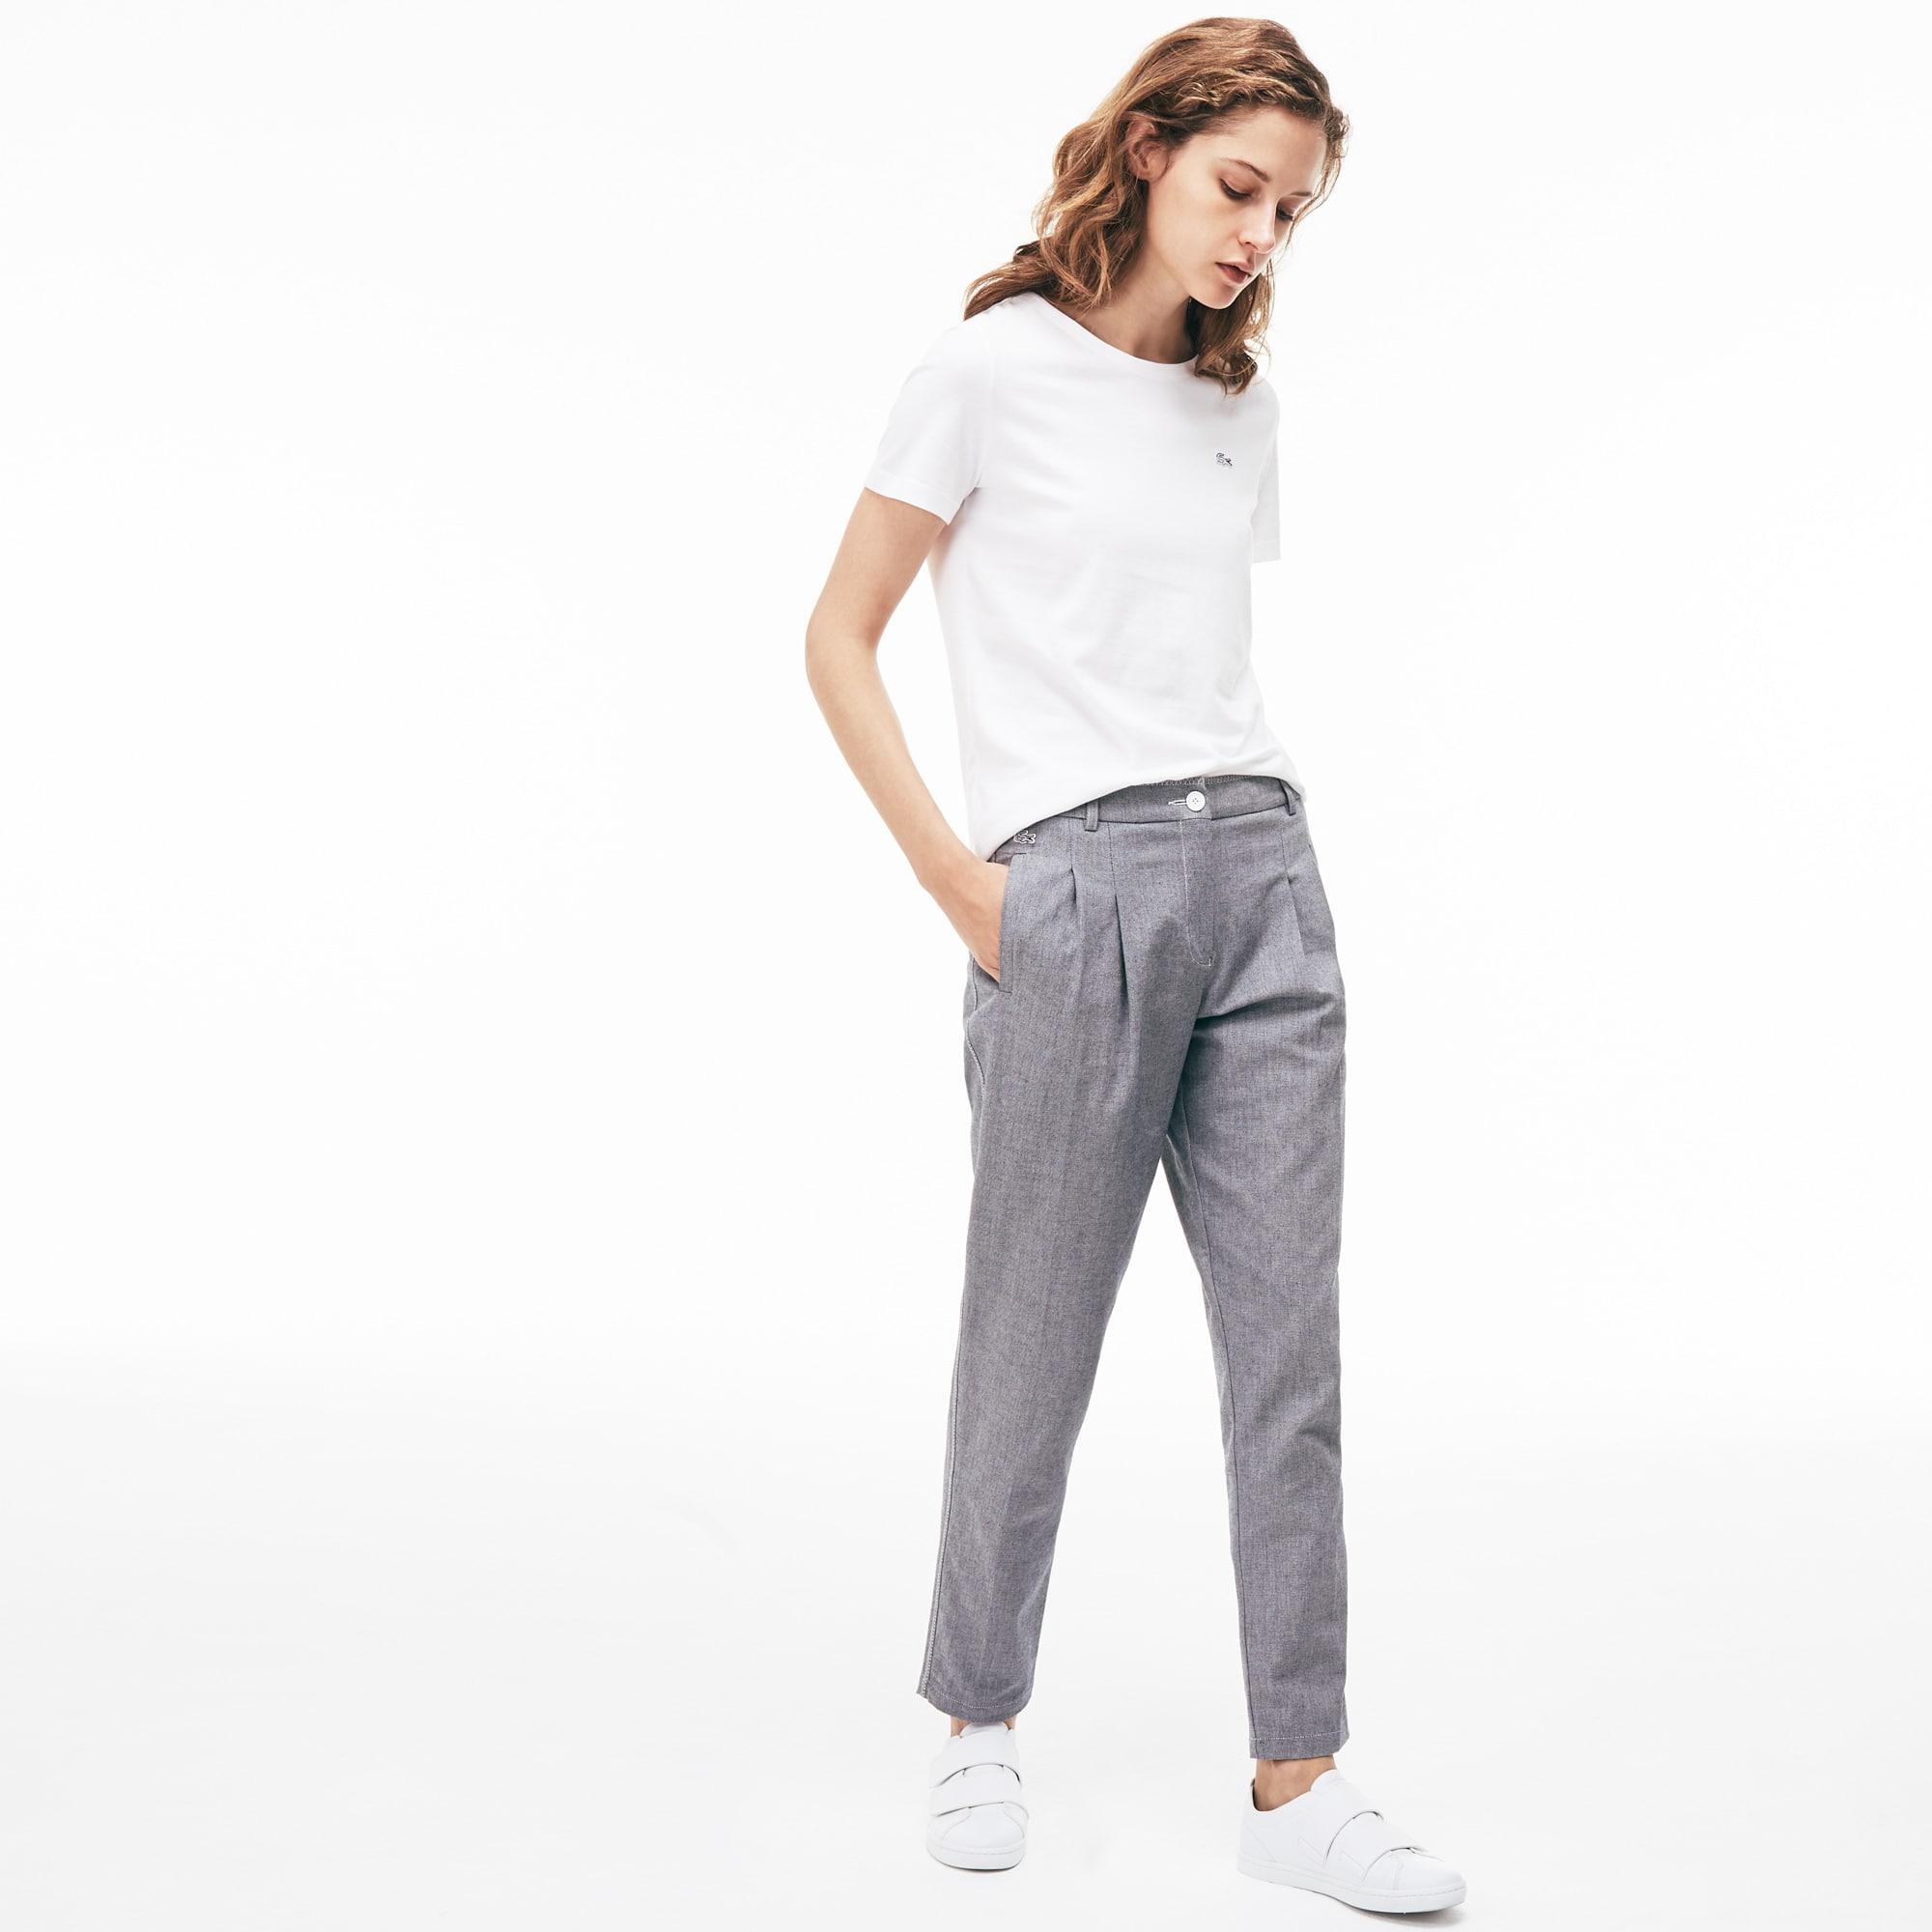 Pantaloni a carota con pince in tela di cotone stretch tinta unita